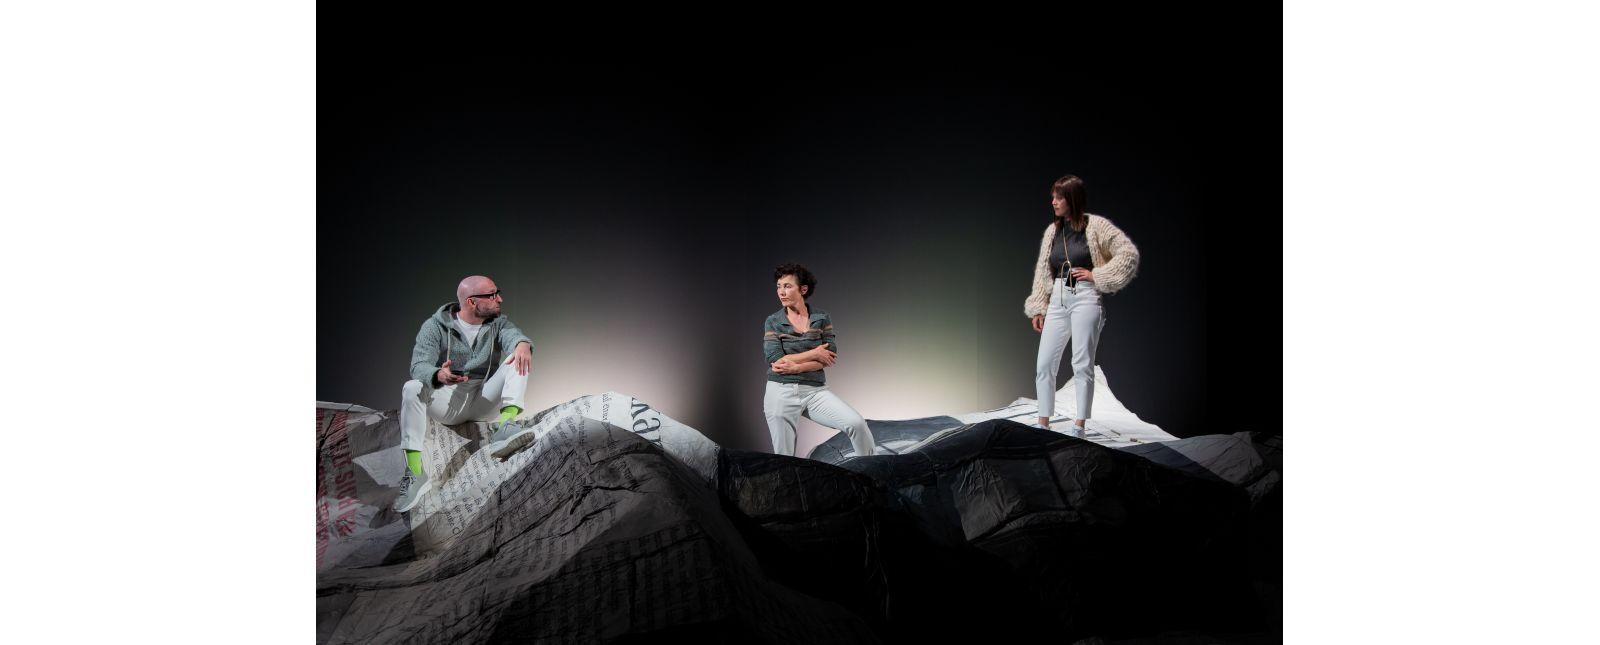 NUR DAS BESTE // Tim Al-Windawe / Elisabeth Kopp / Iris Becher // 2020 // Laura Nickel